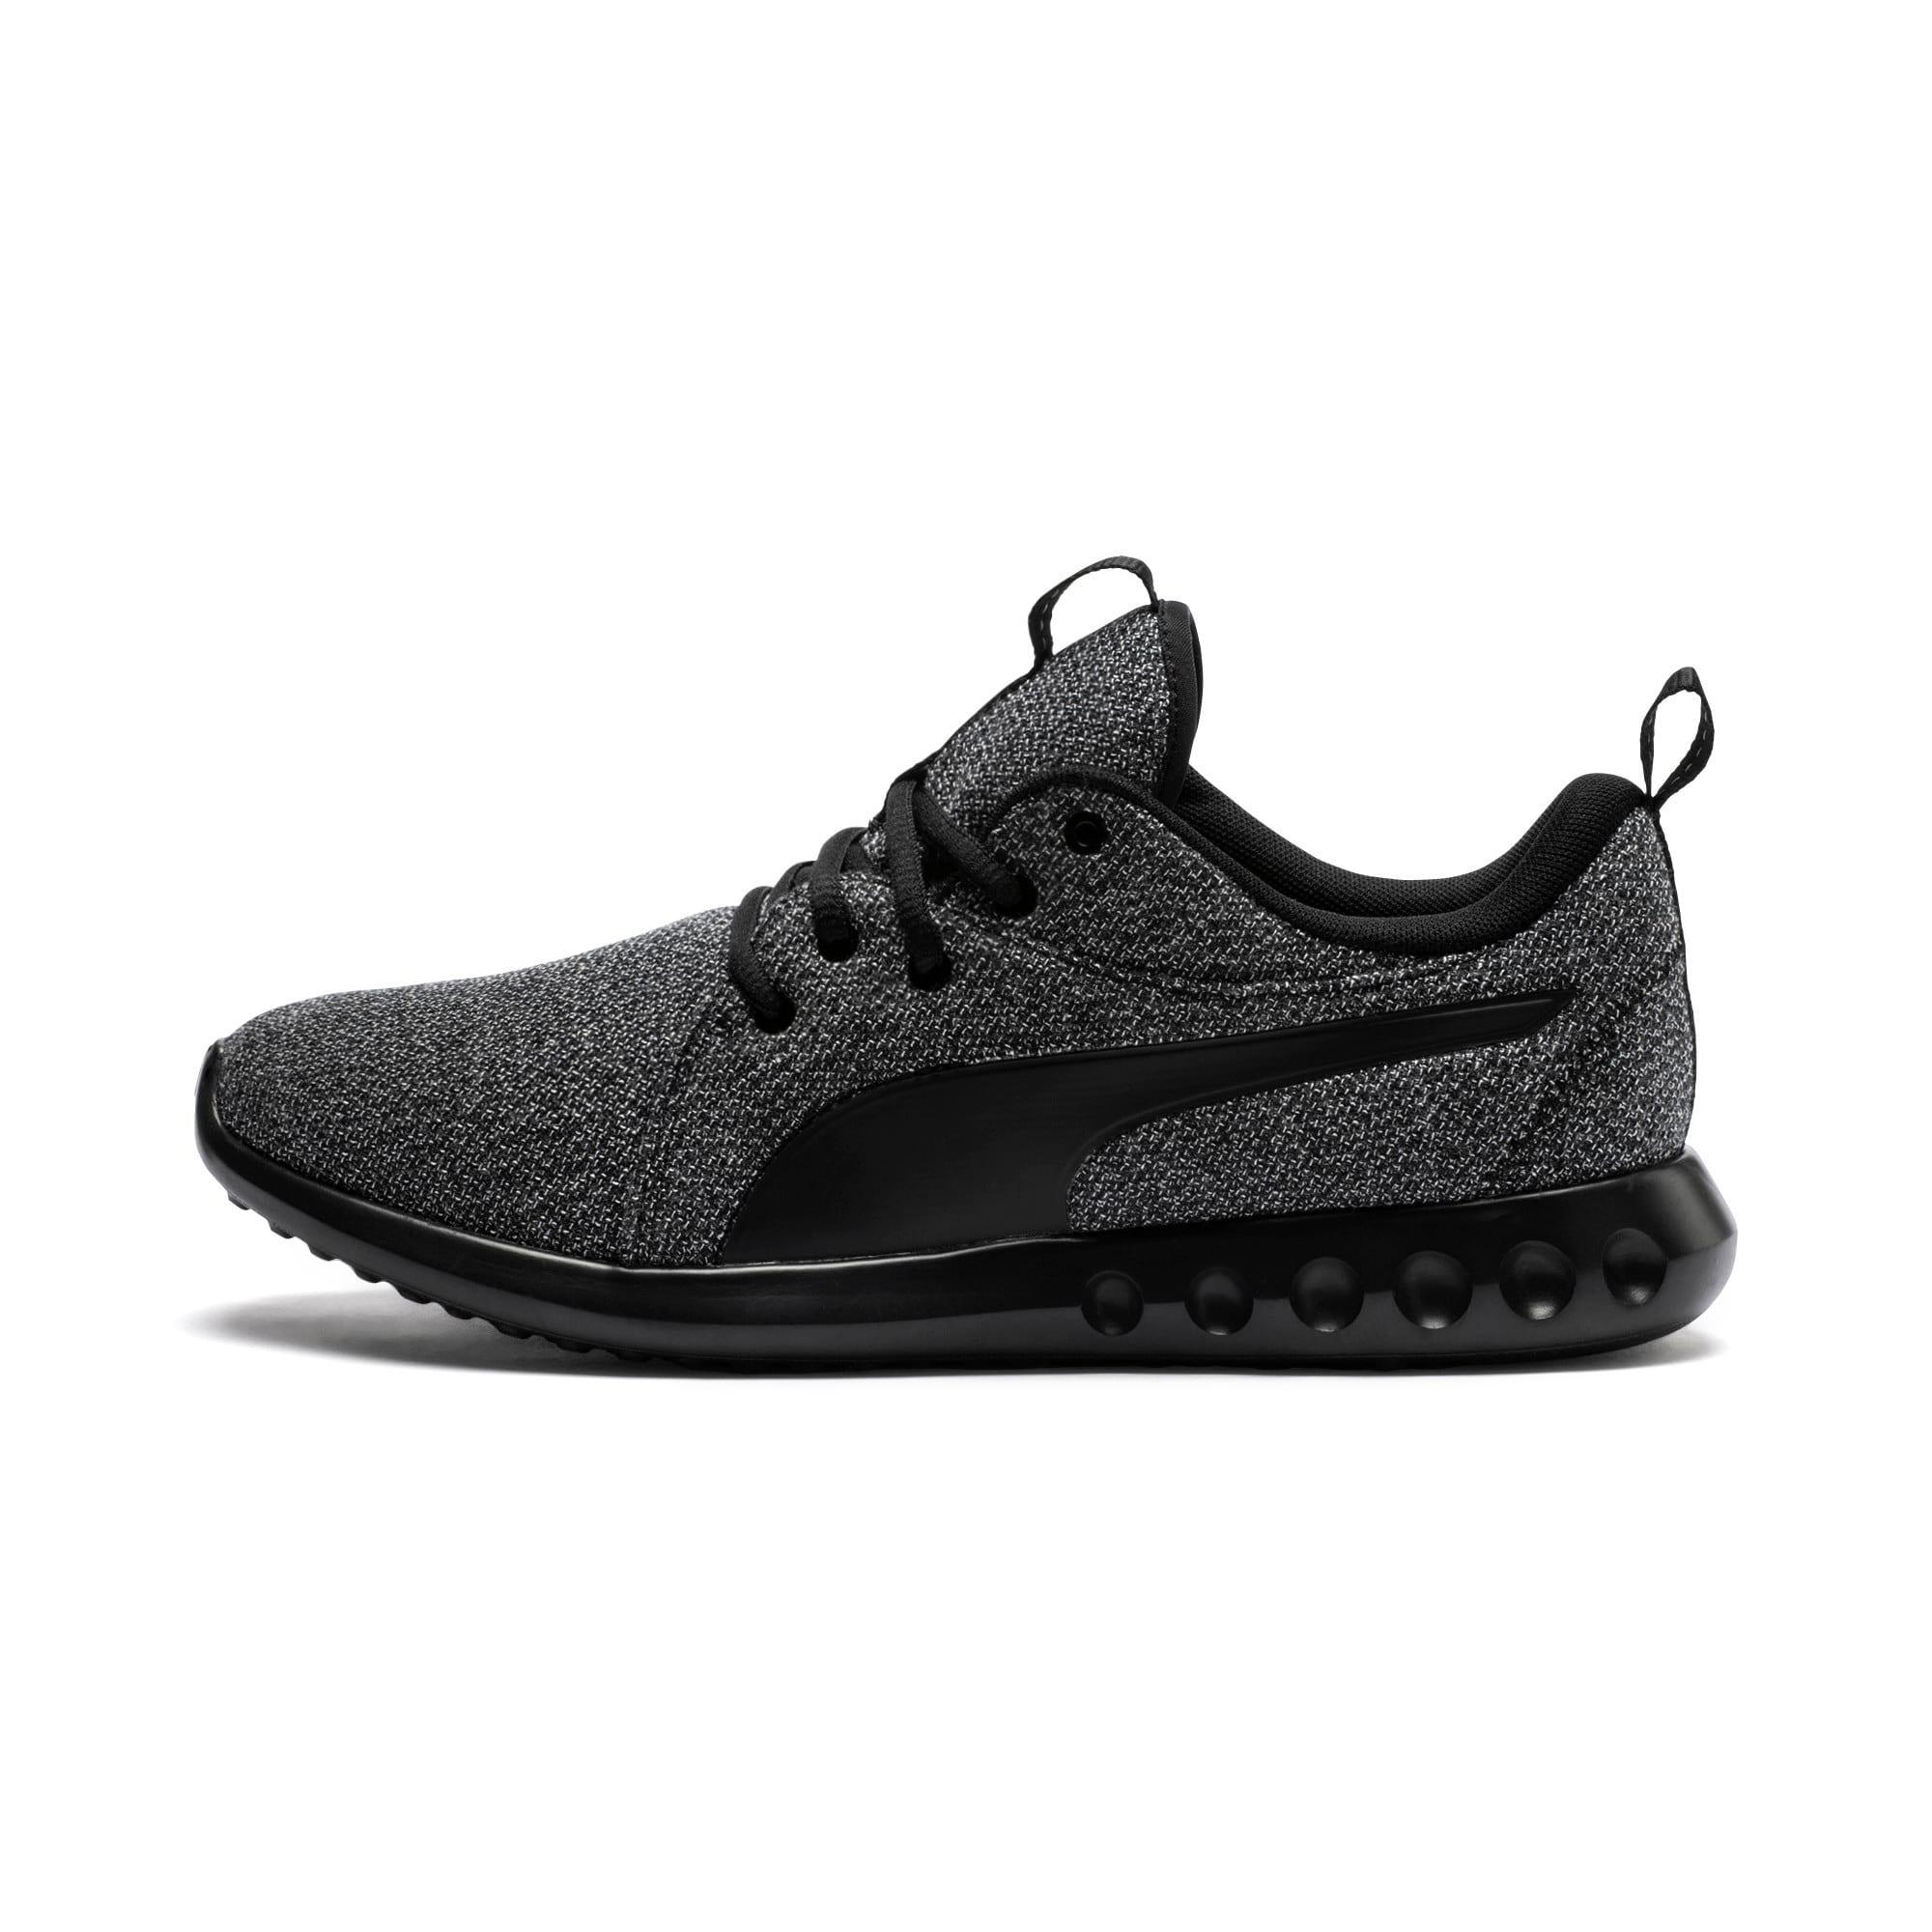 Thumbnail 1 of Carson 2 Knit Men's Training Shoes, Puma Black-Puma Black, medium